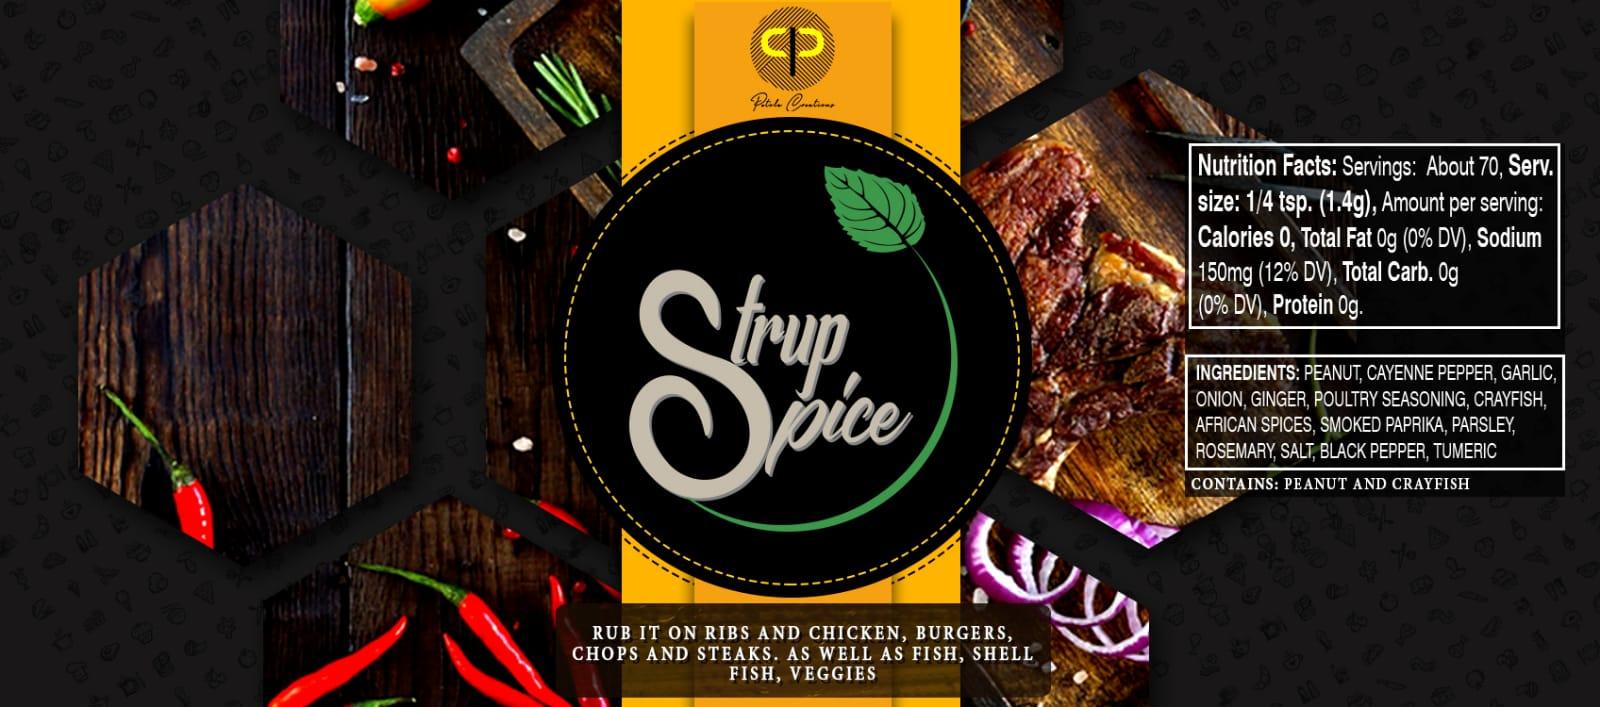 Strup Spice Nutritional Facts